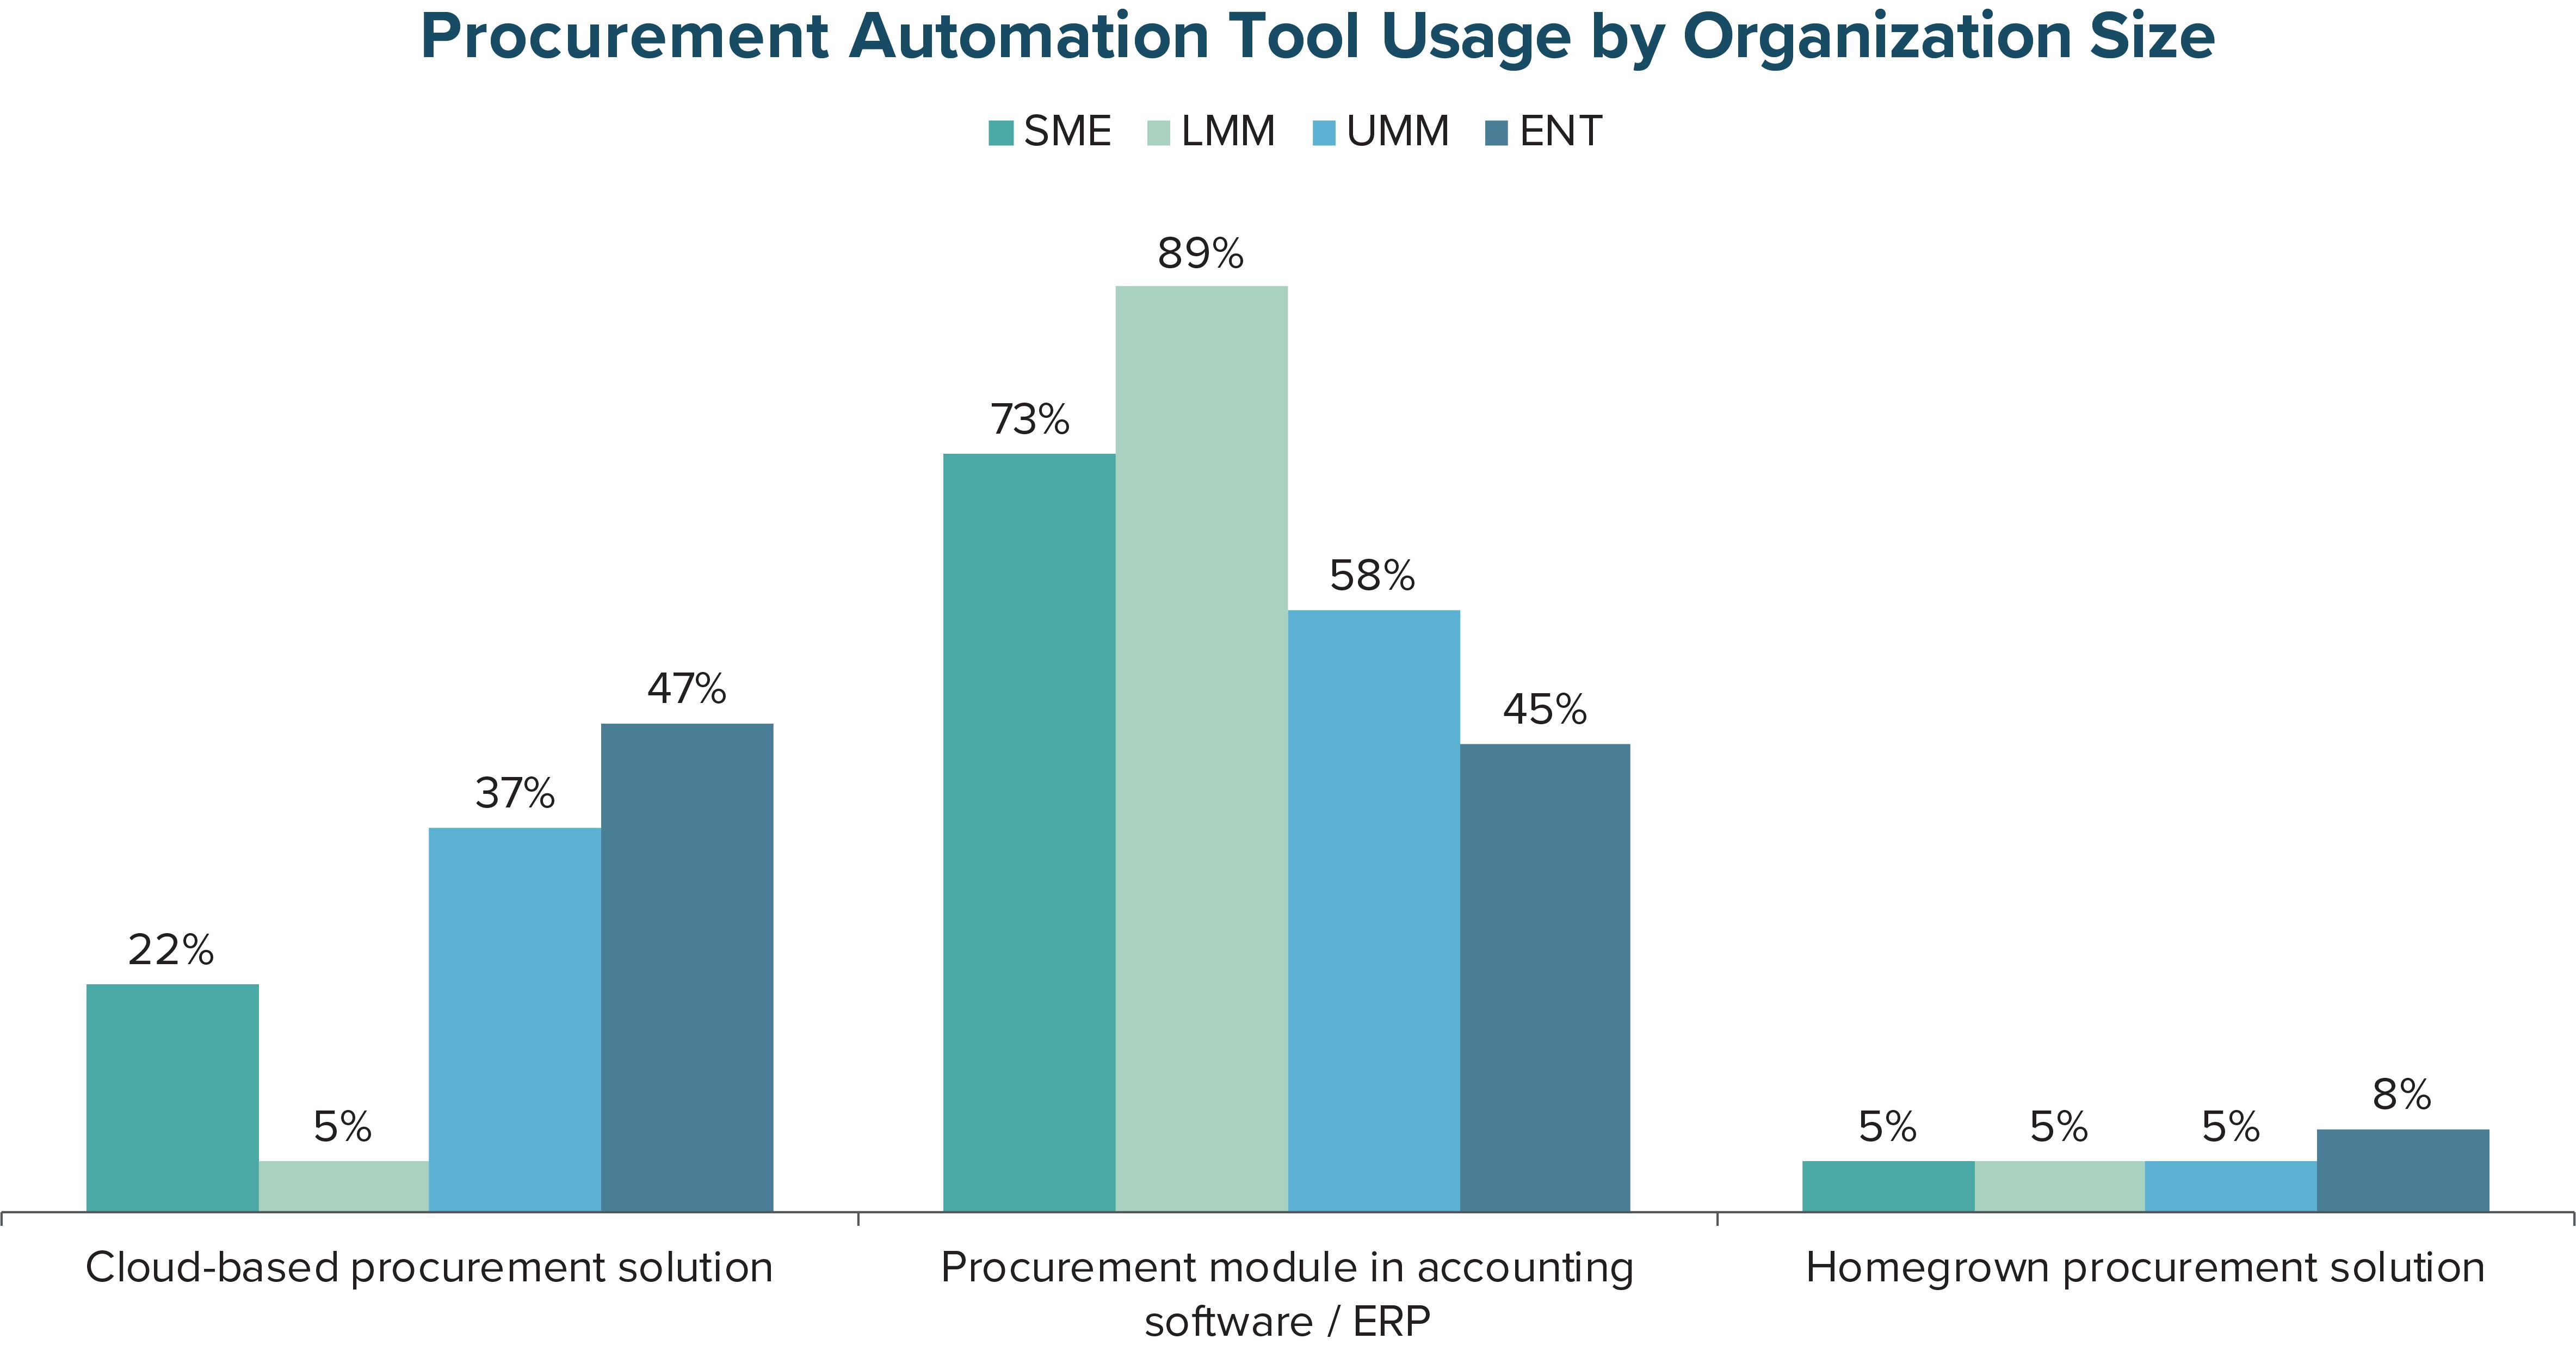 Procurement Automation Tool Usage by Organization Size